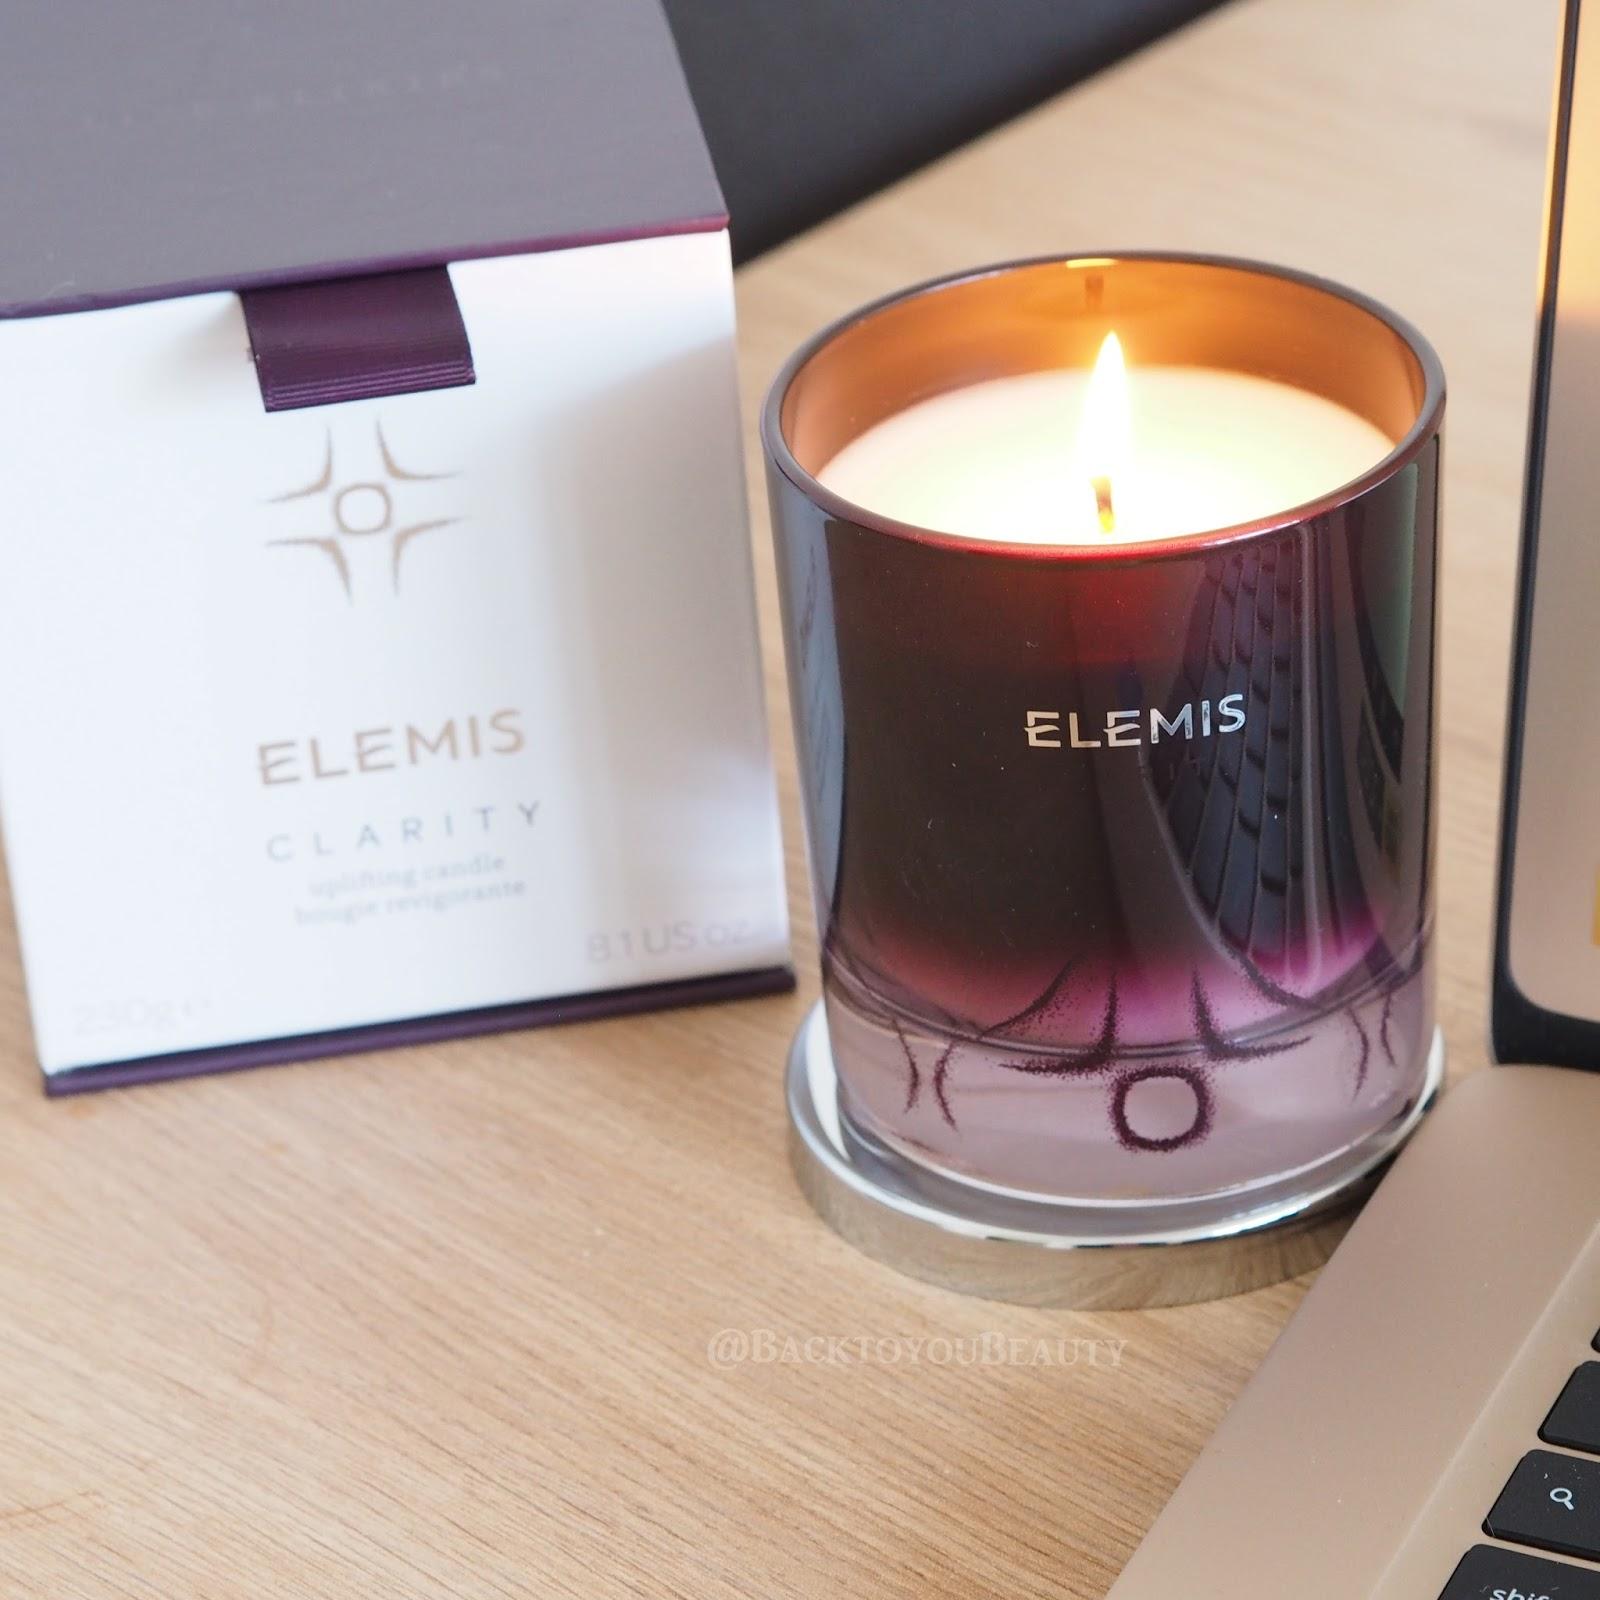 Elemis Clarity Candle